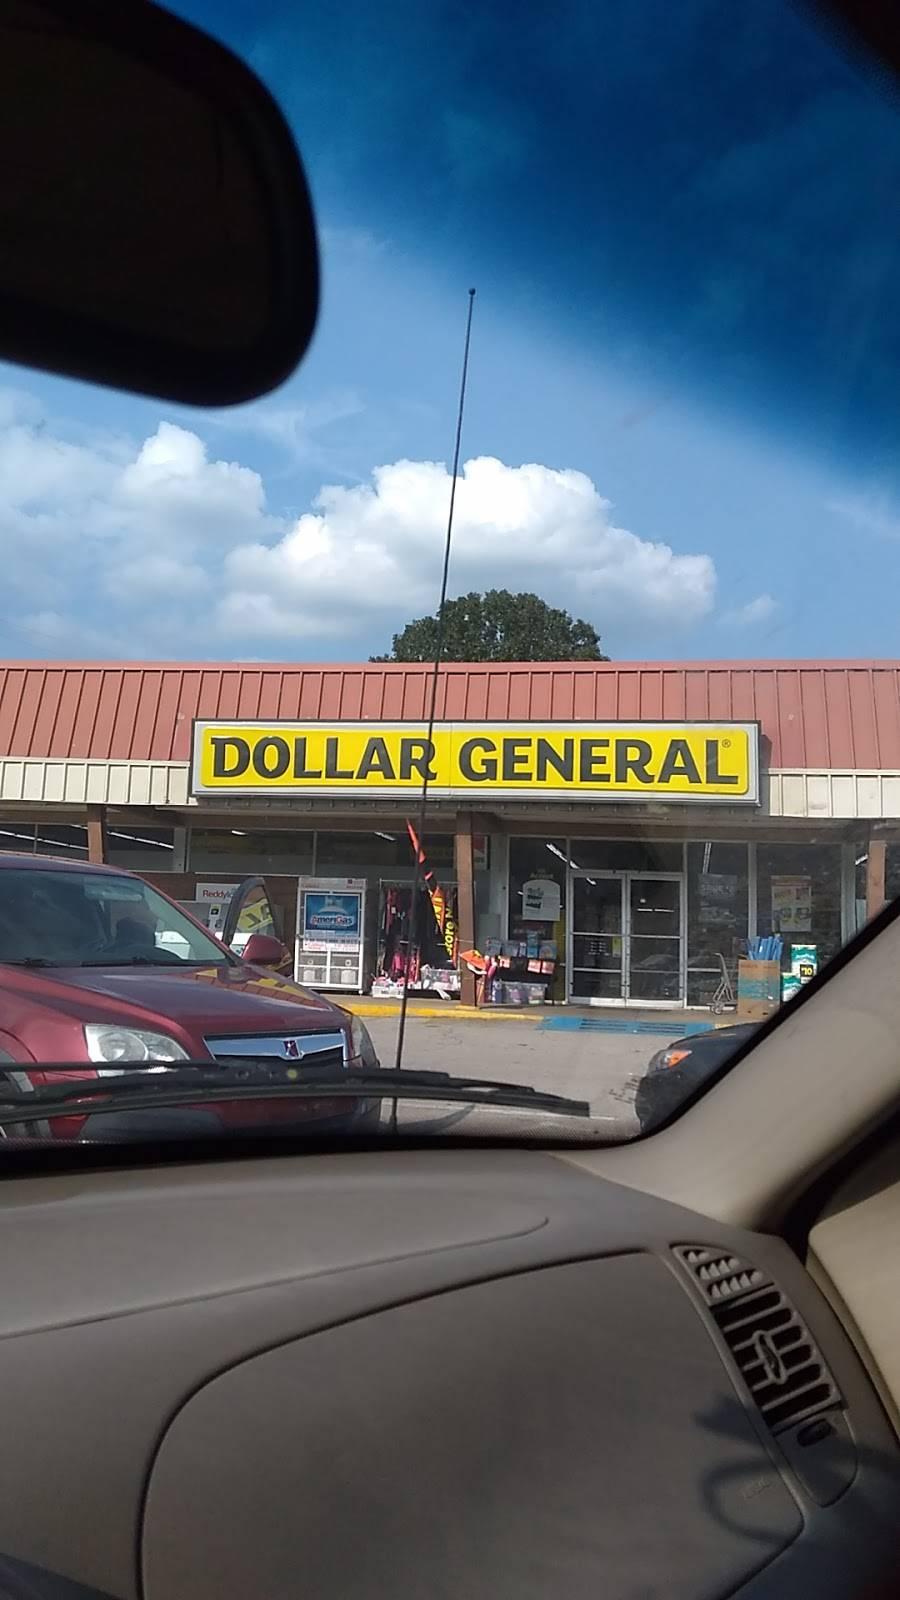 Dollar General - home goods store  | Photo 1 of 9 | Address: 1509 S Main St, Graysville, AL 35073, USA | Phone: (205) 675-2055